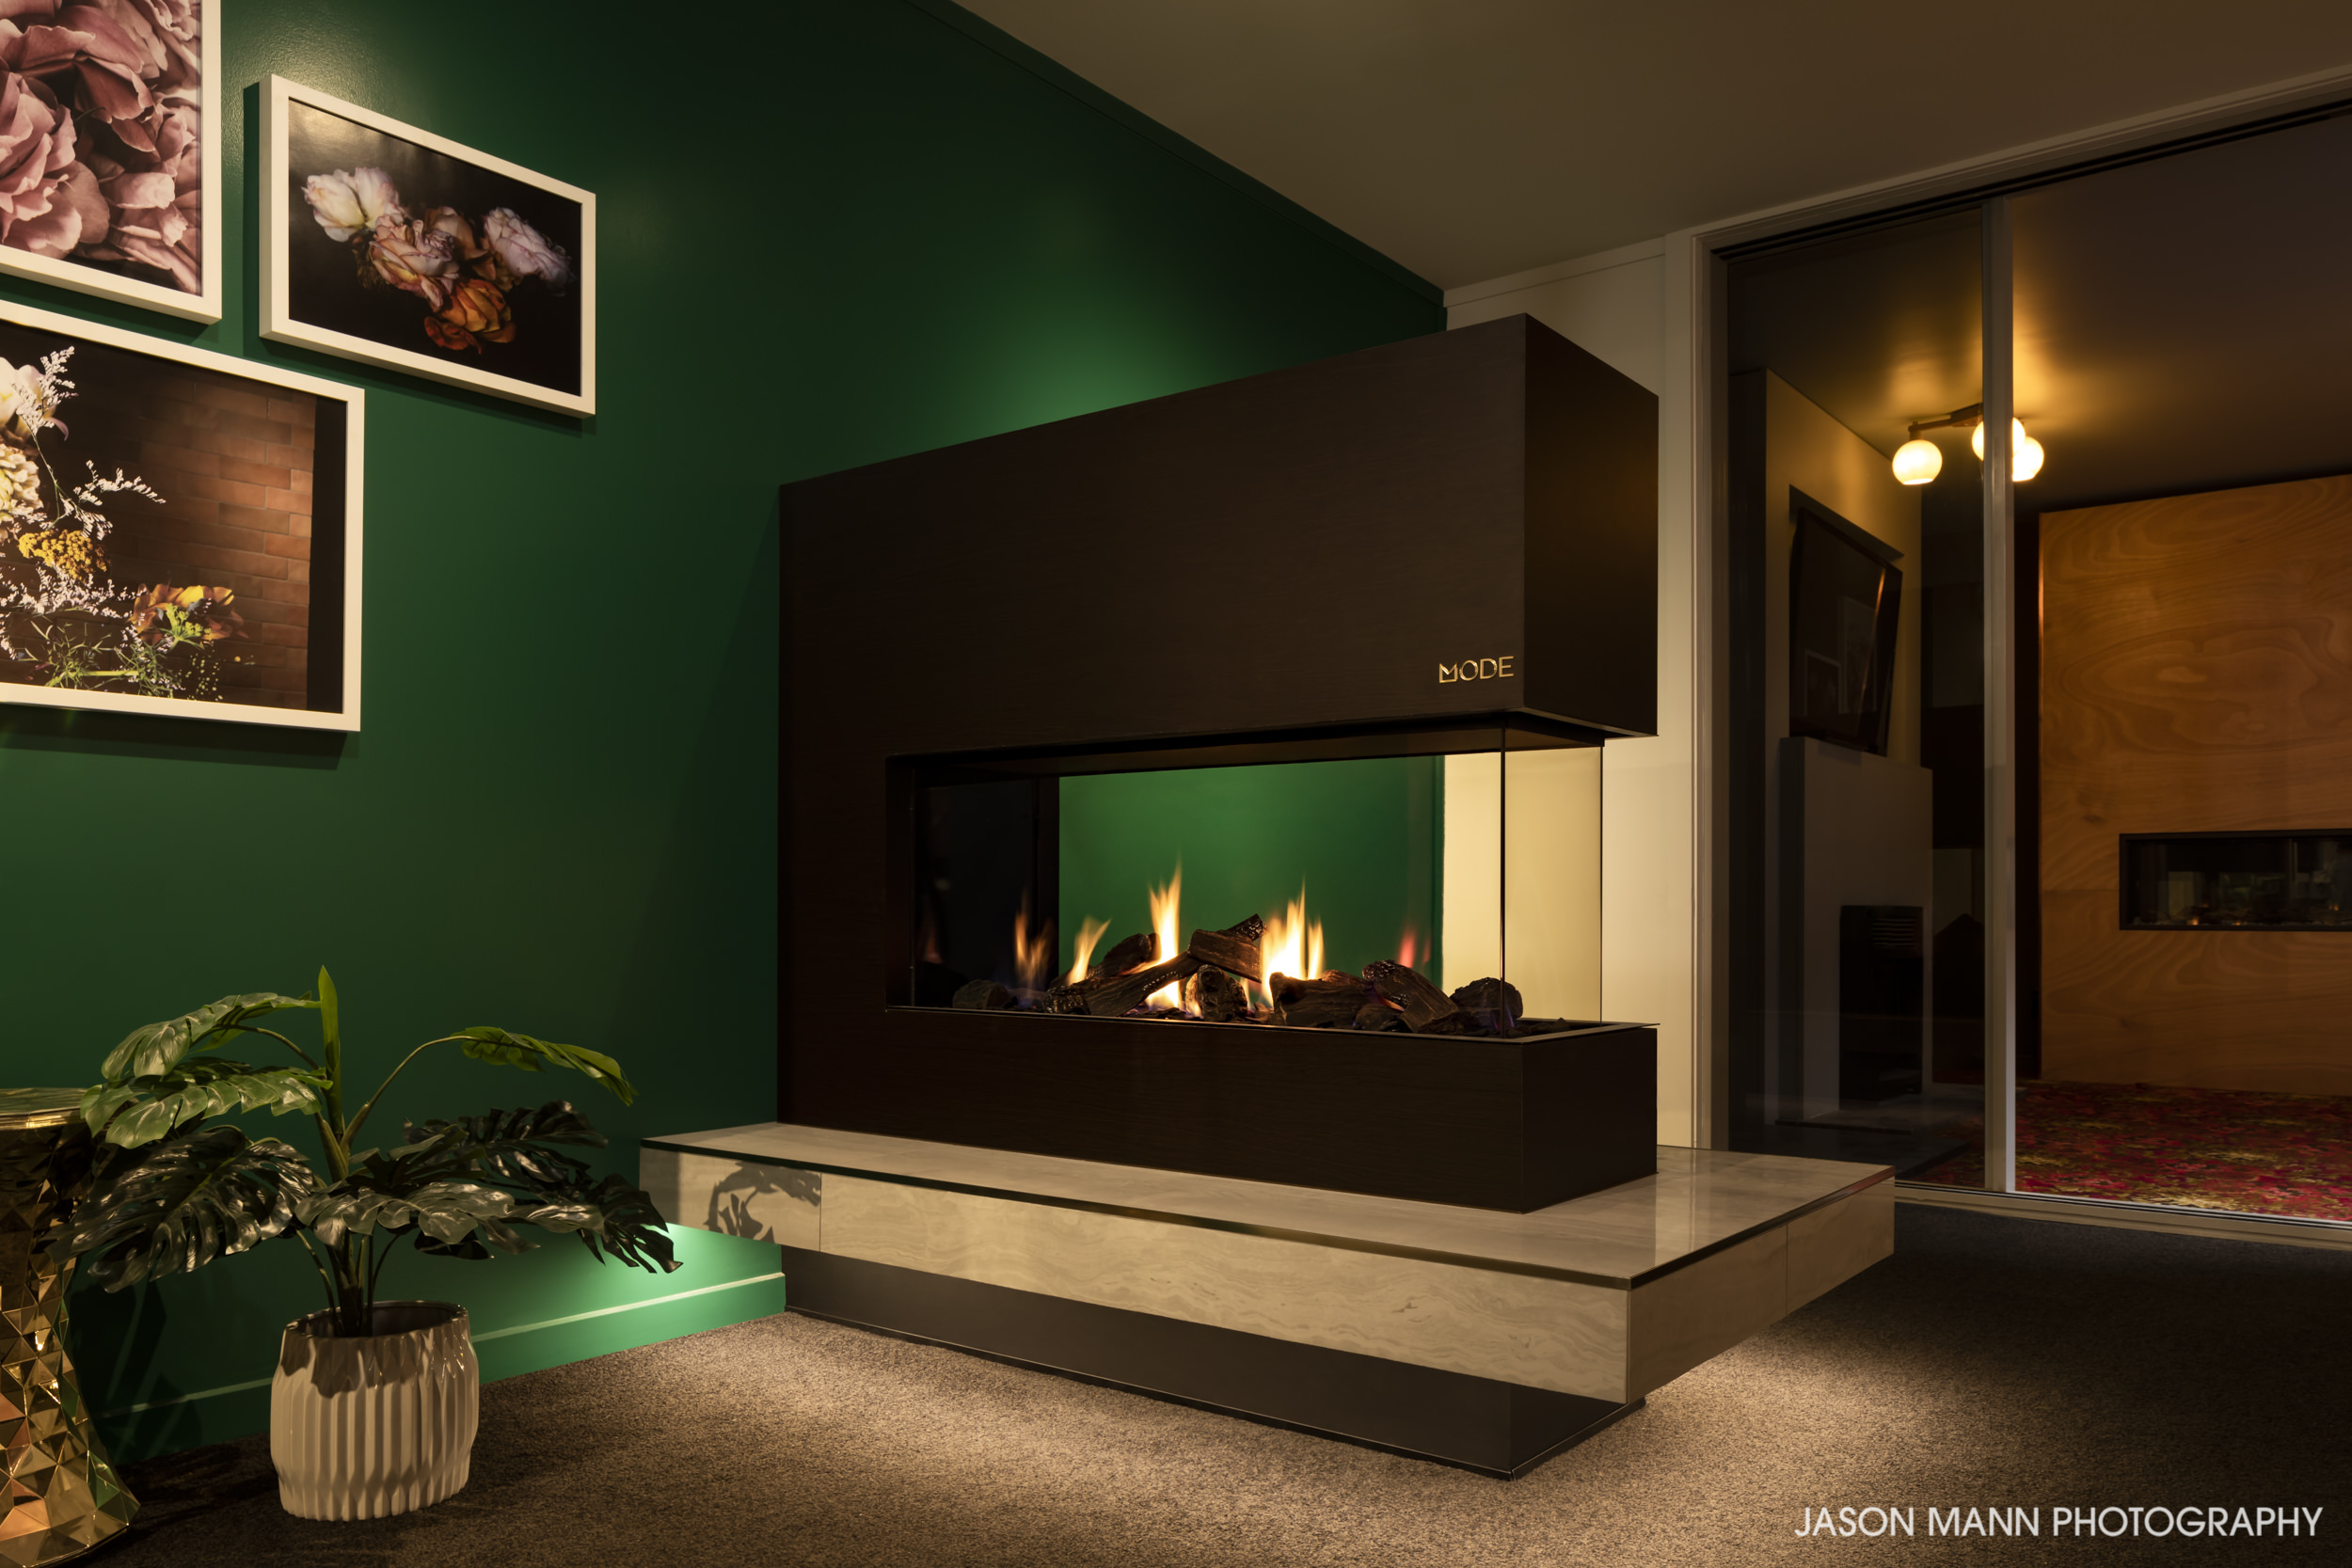 Jason_Mann_Fireplaces_02.jpg